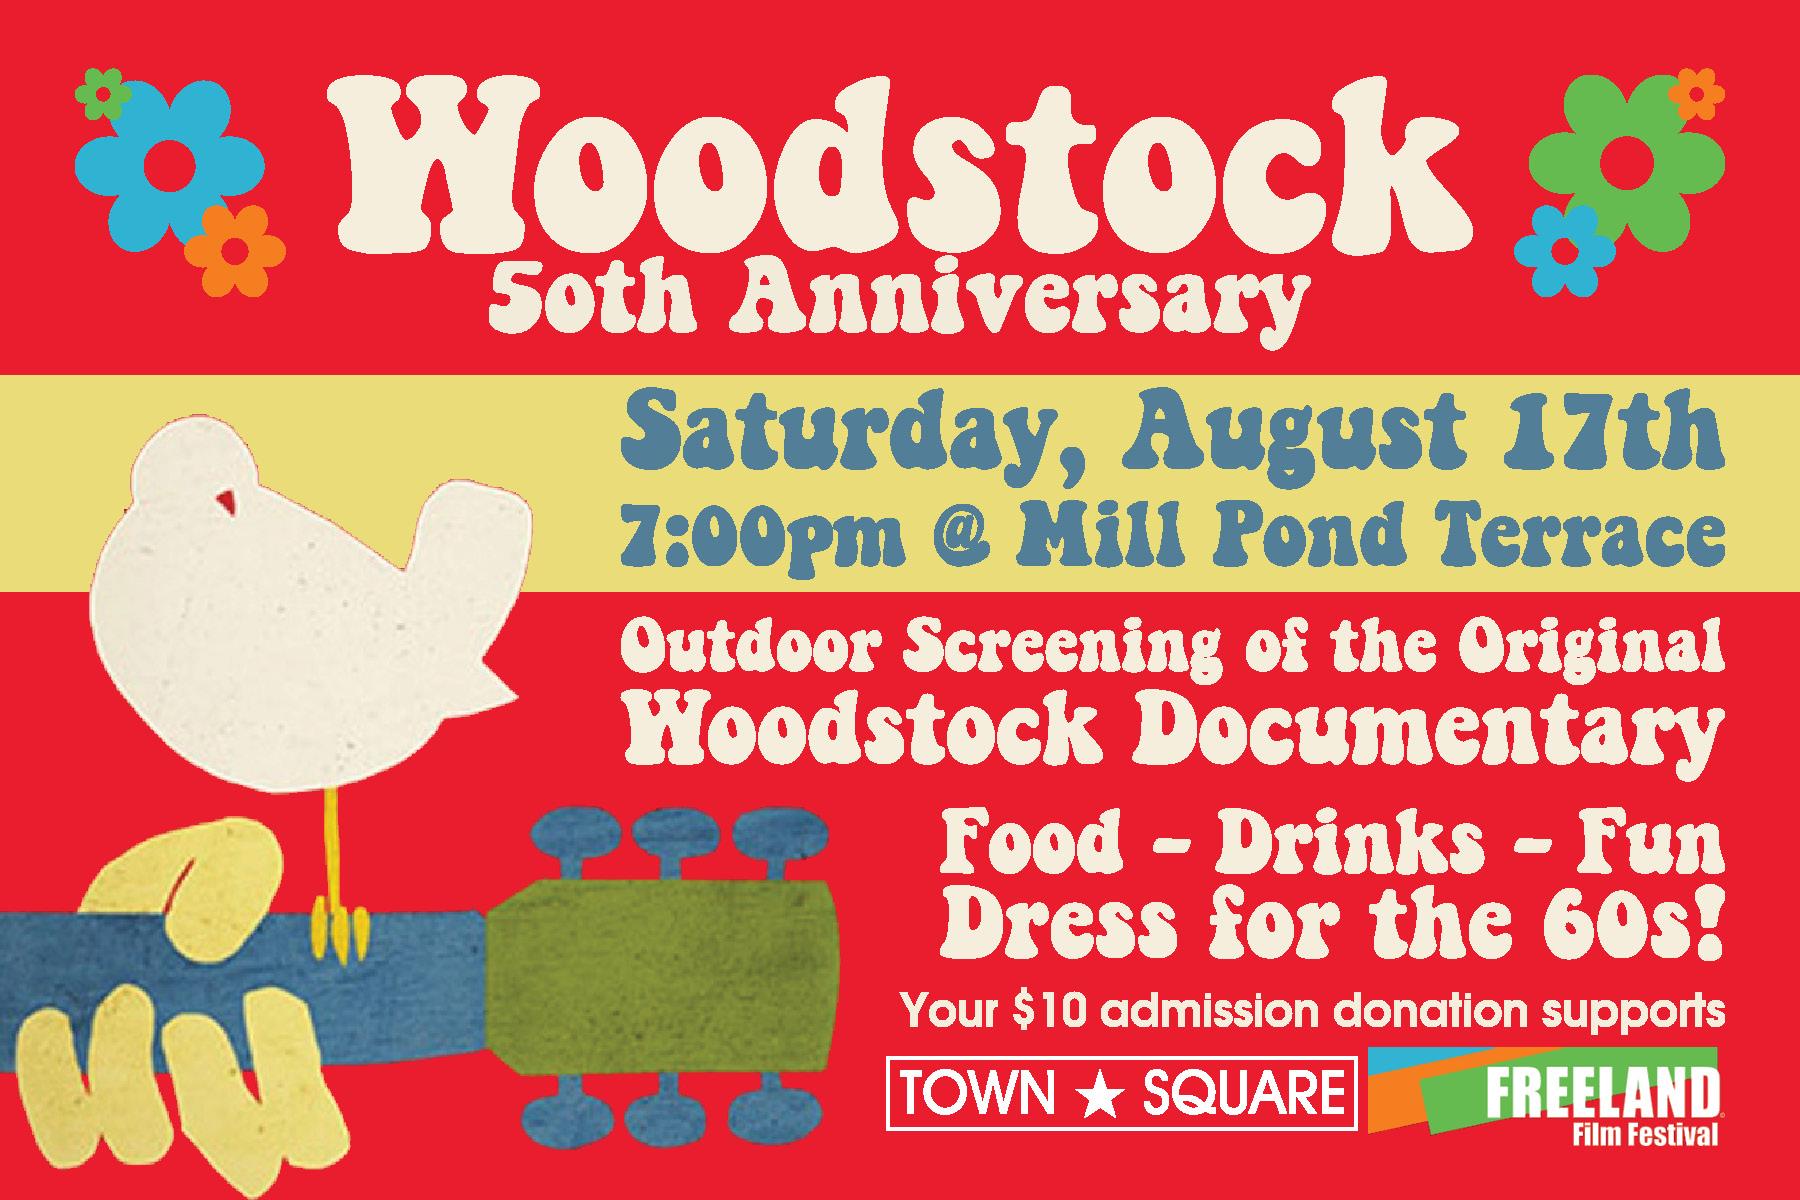 Woodtock Party Postcard - 6x4.jpg